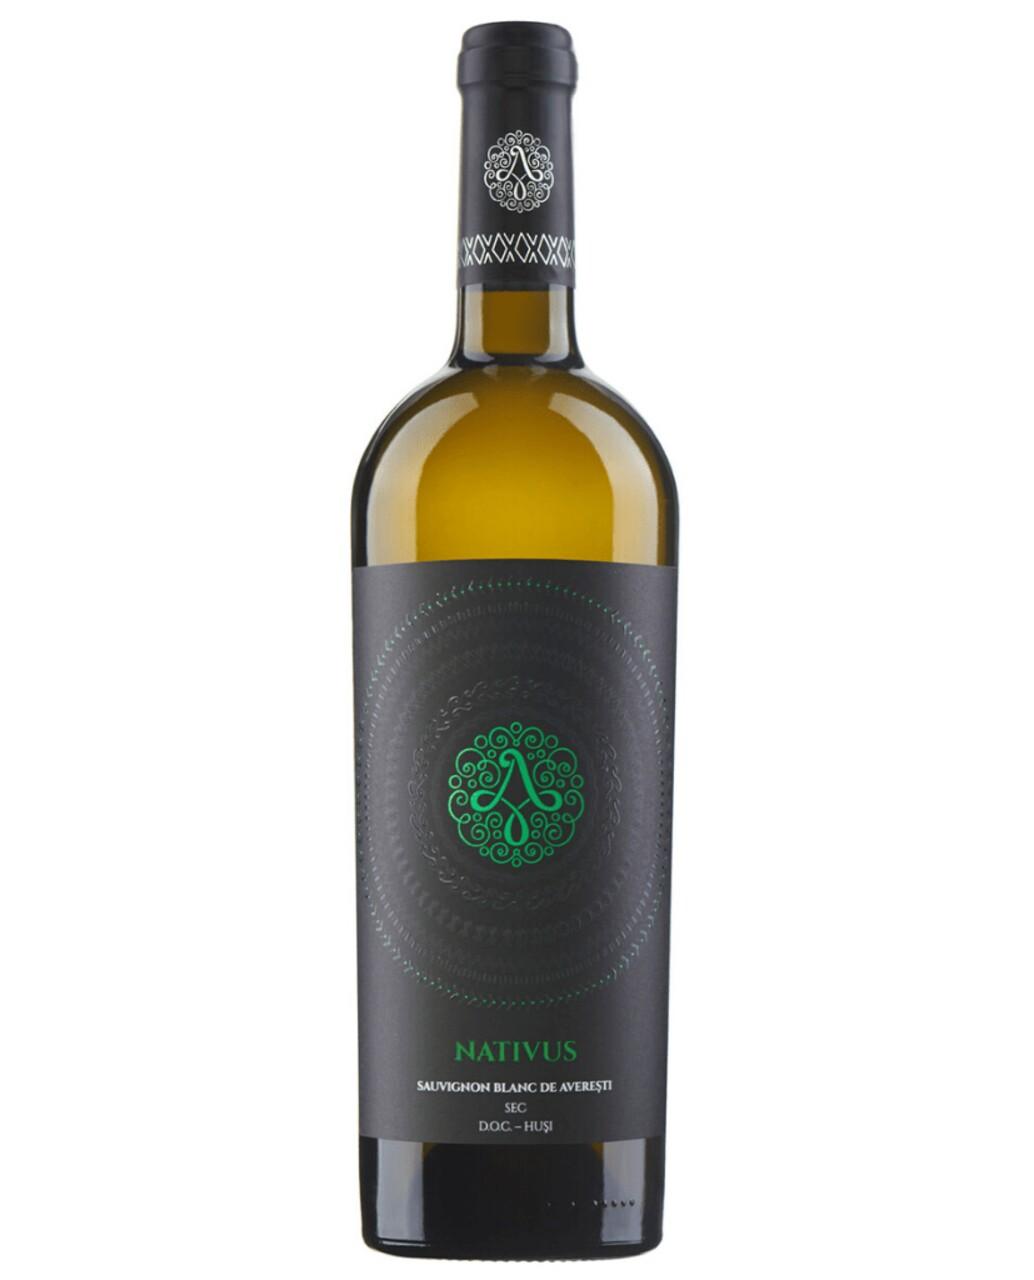 Sauvignon Blanc de Averesti Nativus